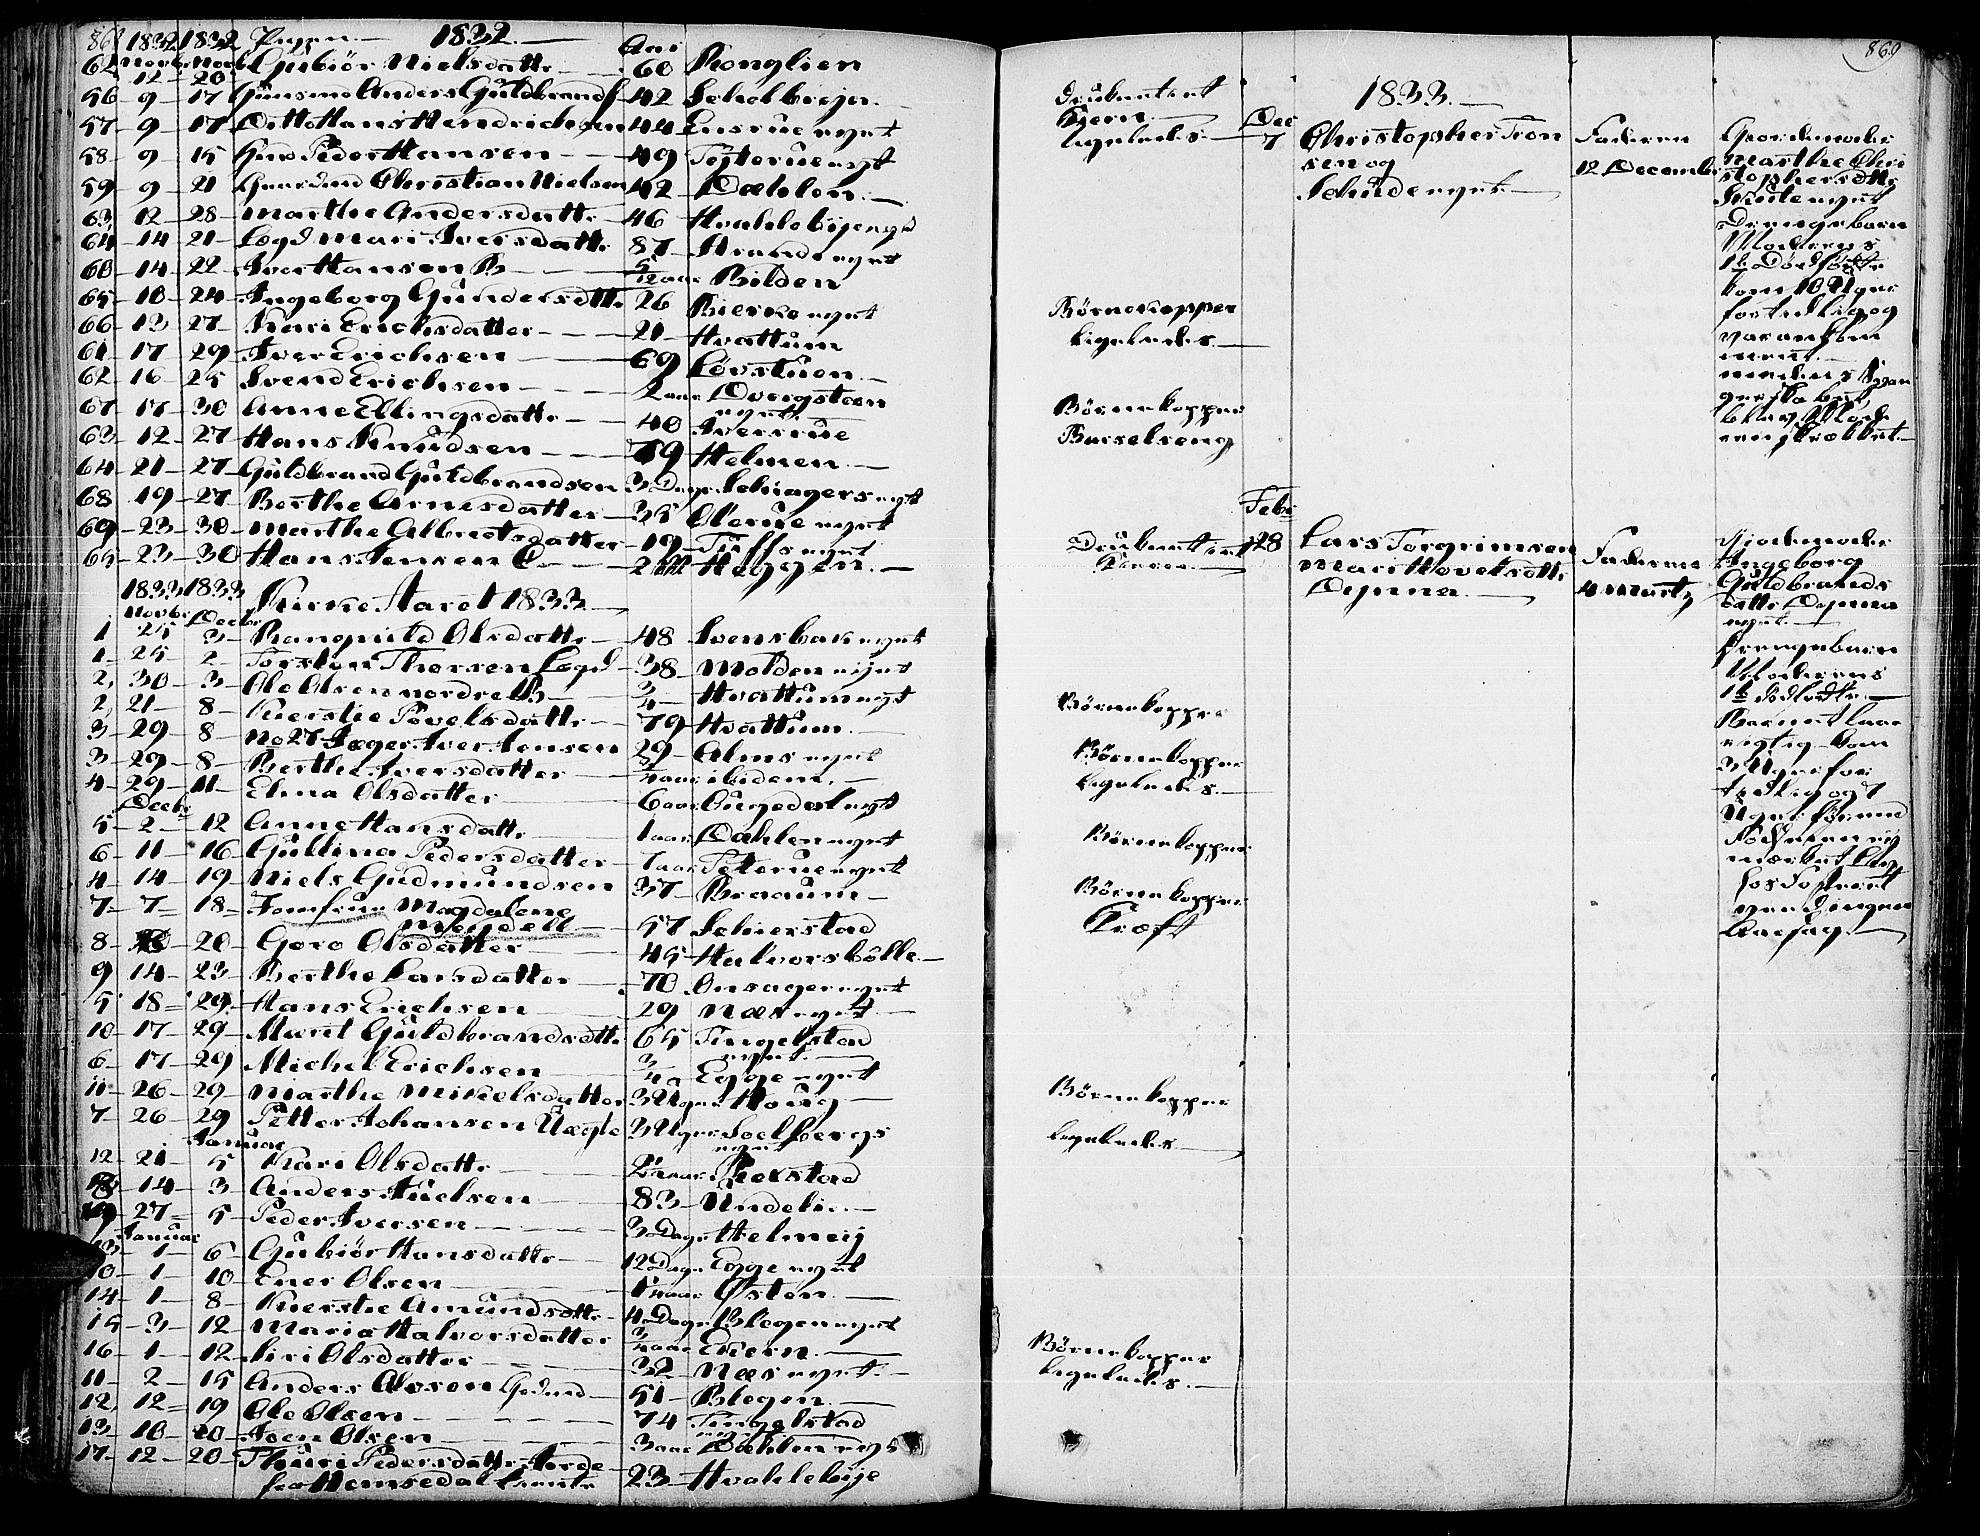 SAH, Gran prestekontor, Ministerialbok nr. 10, 1824-1842, s. 868-869